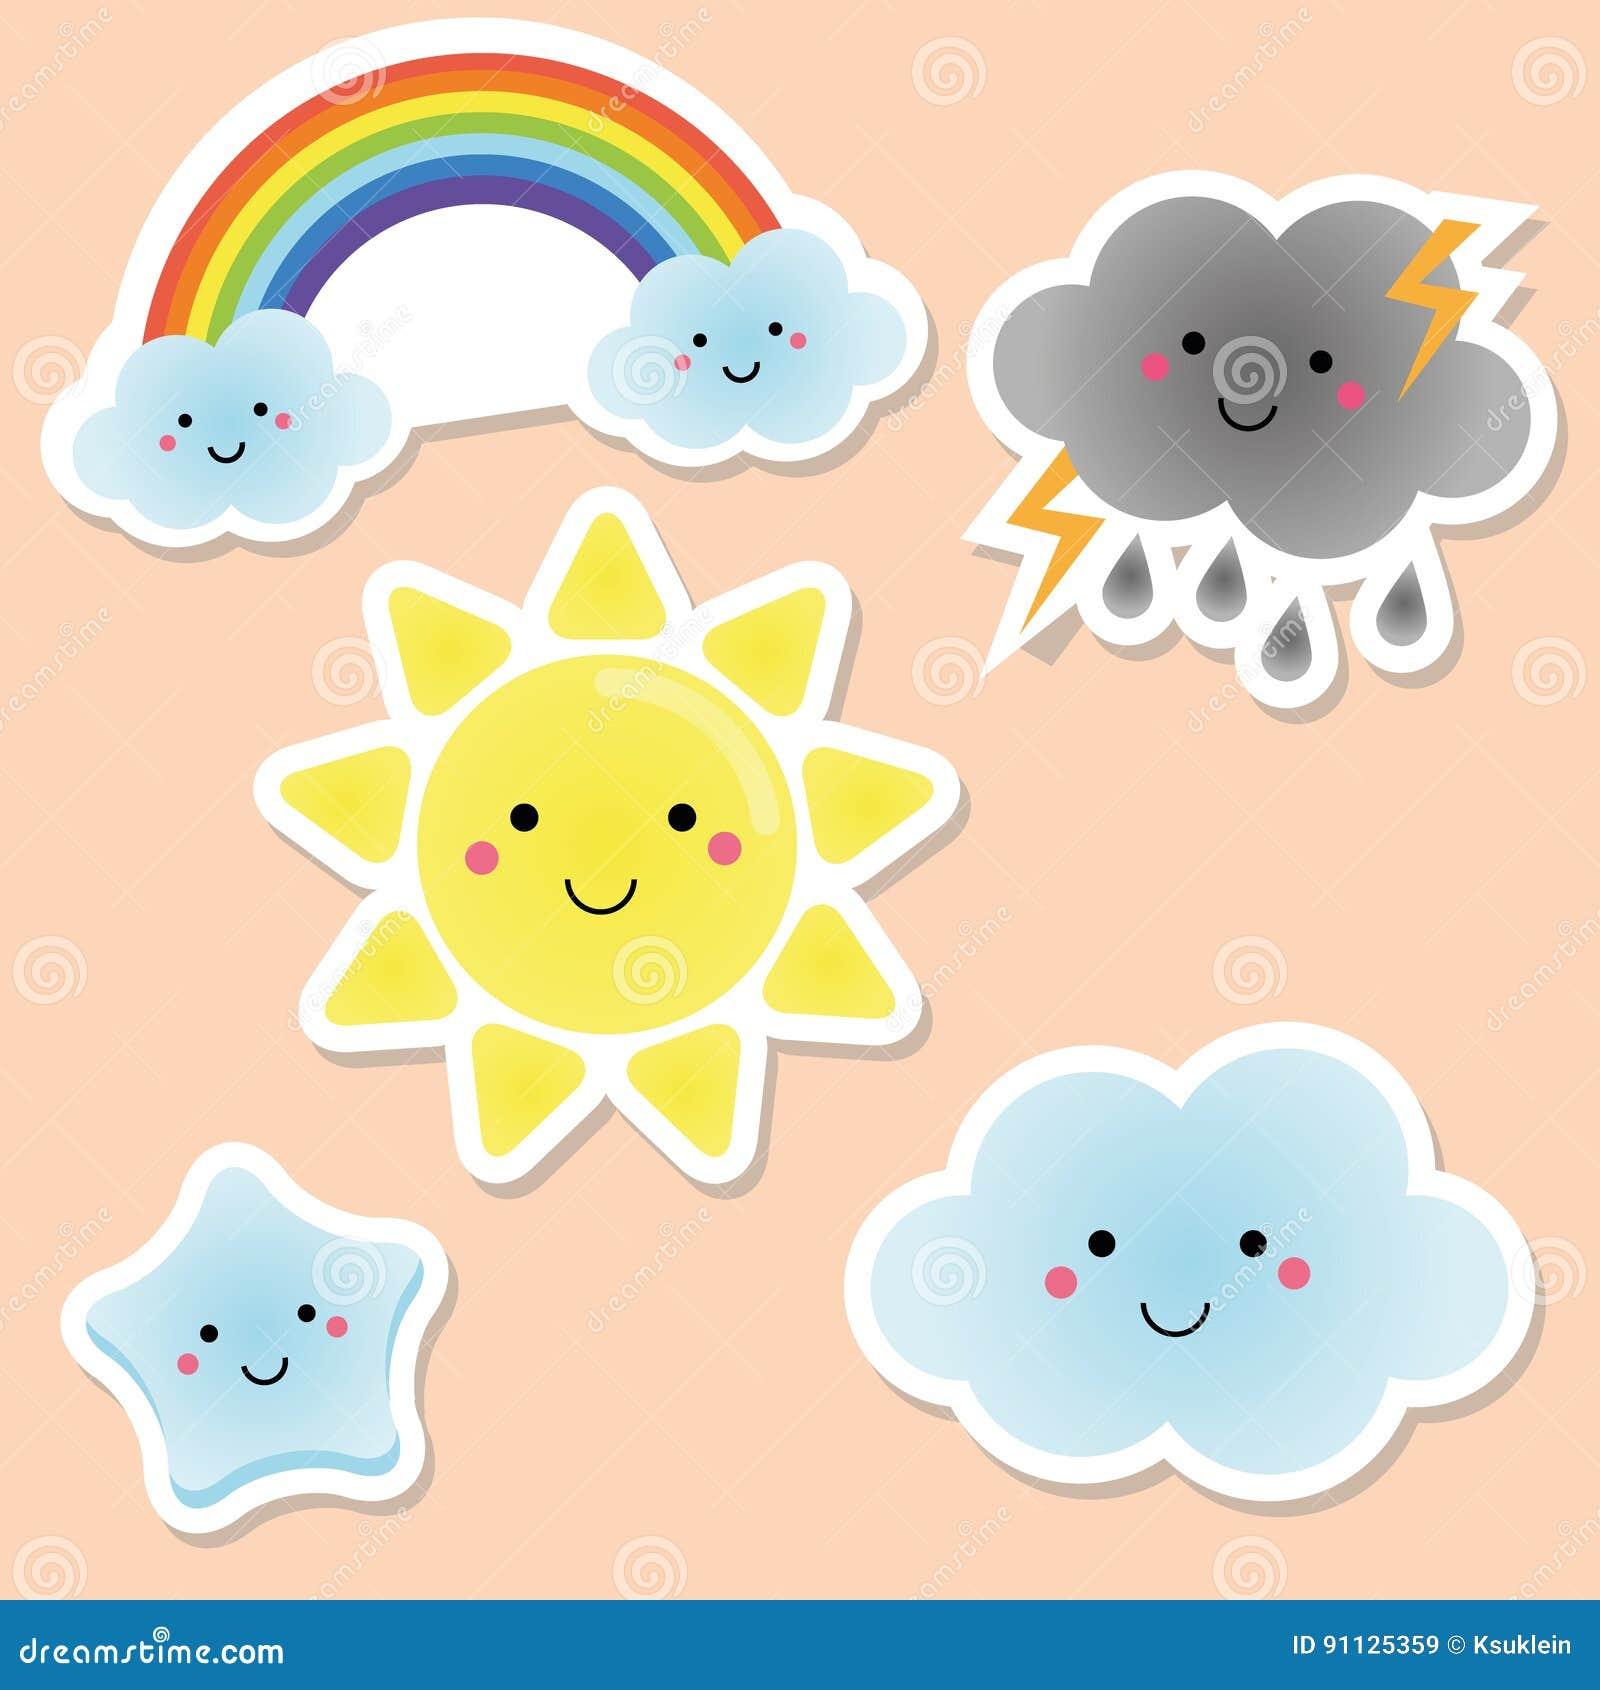 L ments mignons de temps et de ciel le soleil de kawaii - Image arc en ciel gratuite ...